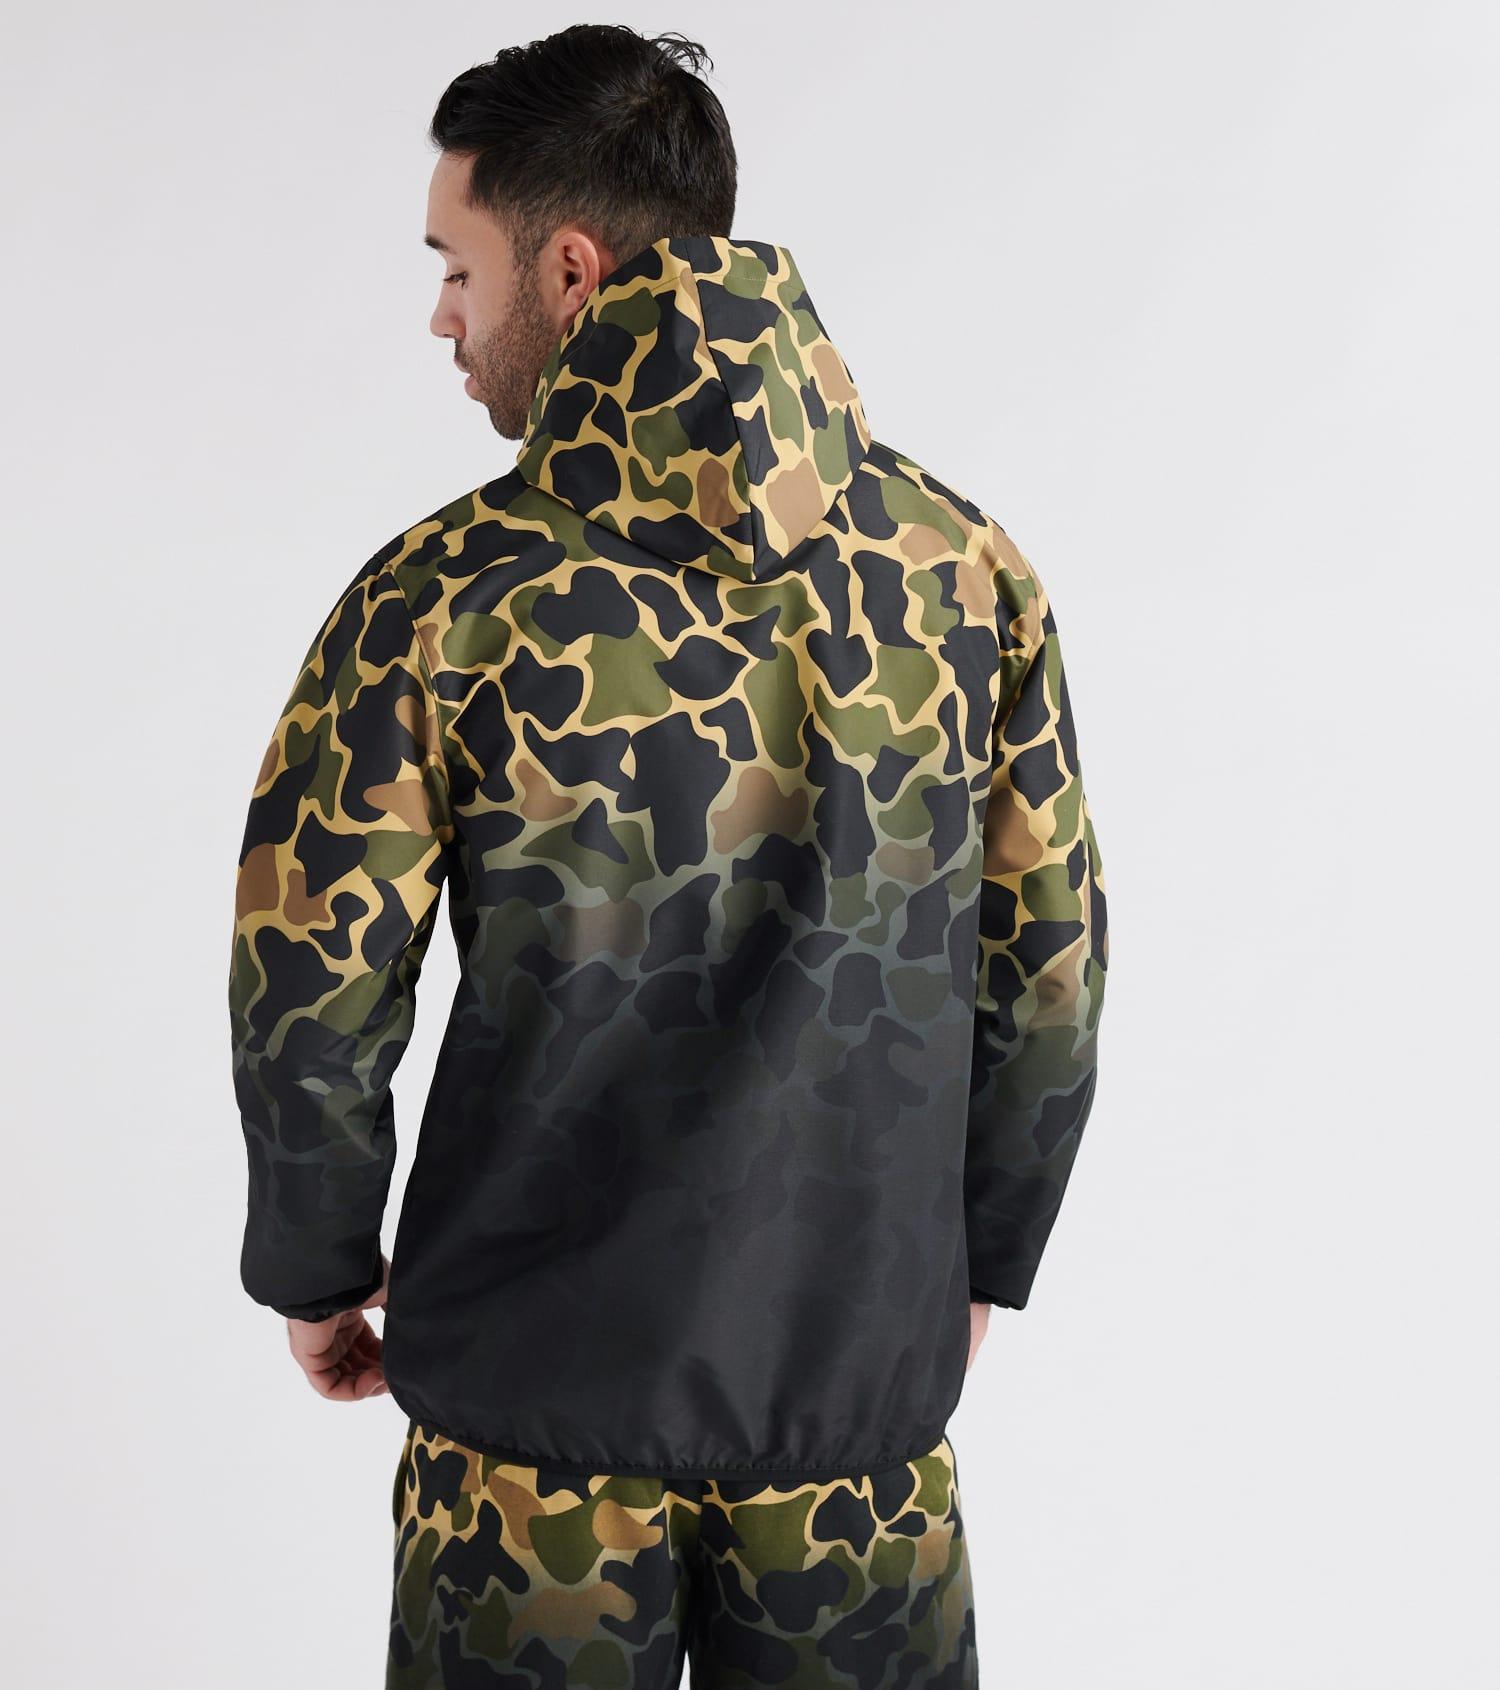 wholesale online designer fashion official Camo Windbreaker Jacket